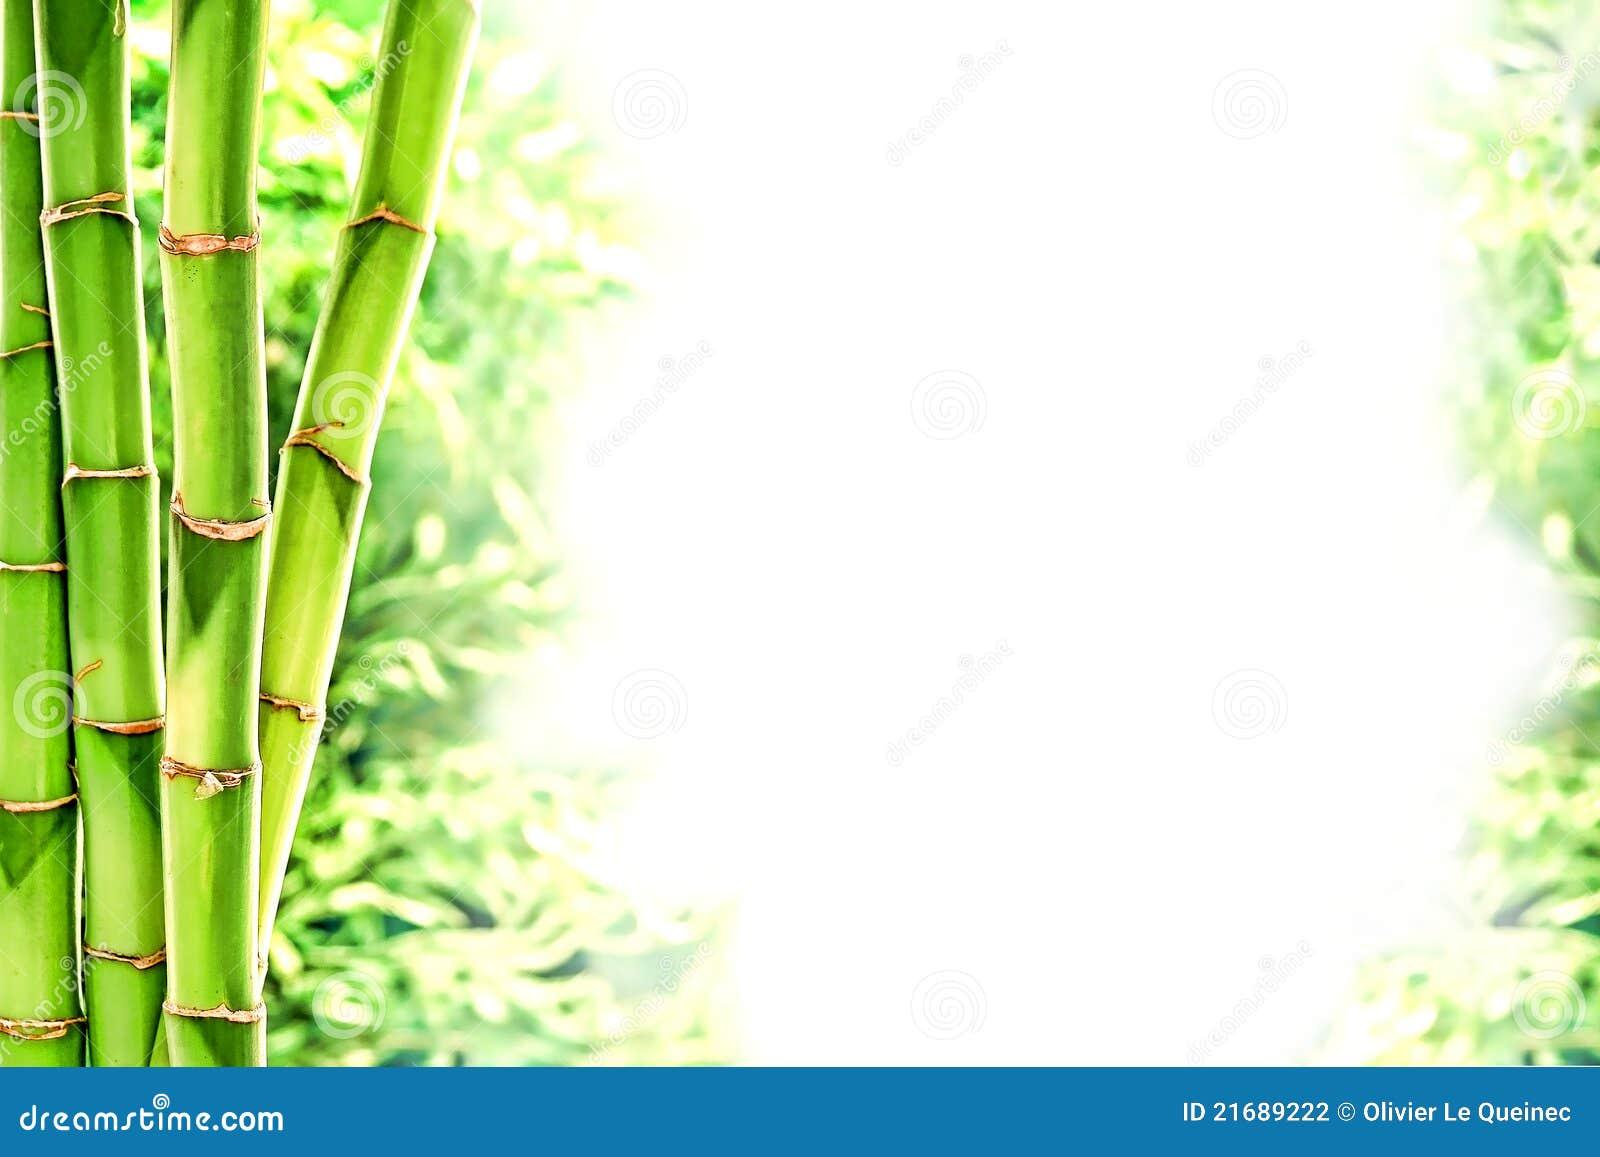 chemin es en bambou et herbe sauvage au dessus du fond blanc photo stock image du centrales. Black Bedroom Furniture Sets. Home Design Ideas